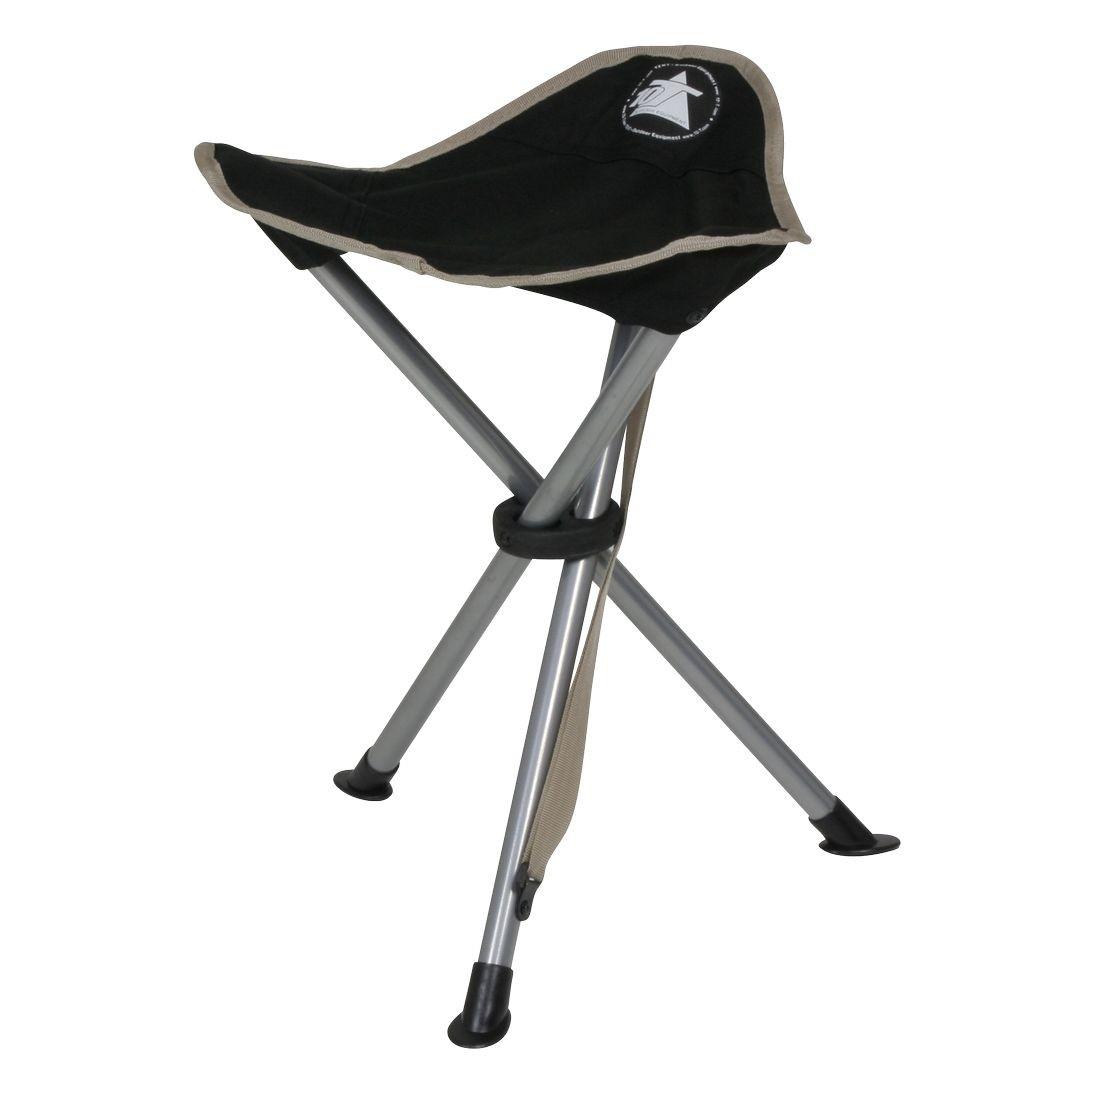 10t Tripod Camping Chair Three Leg Stool 45 Cm Seat